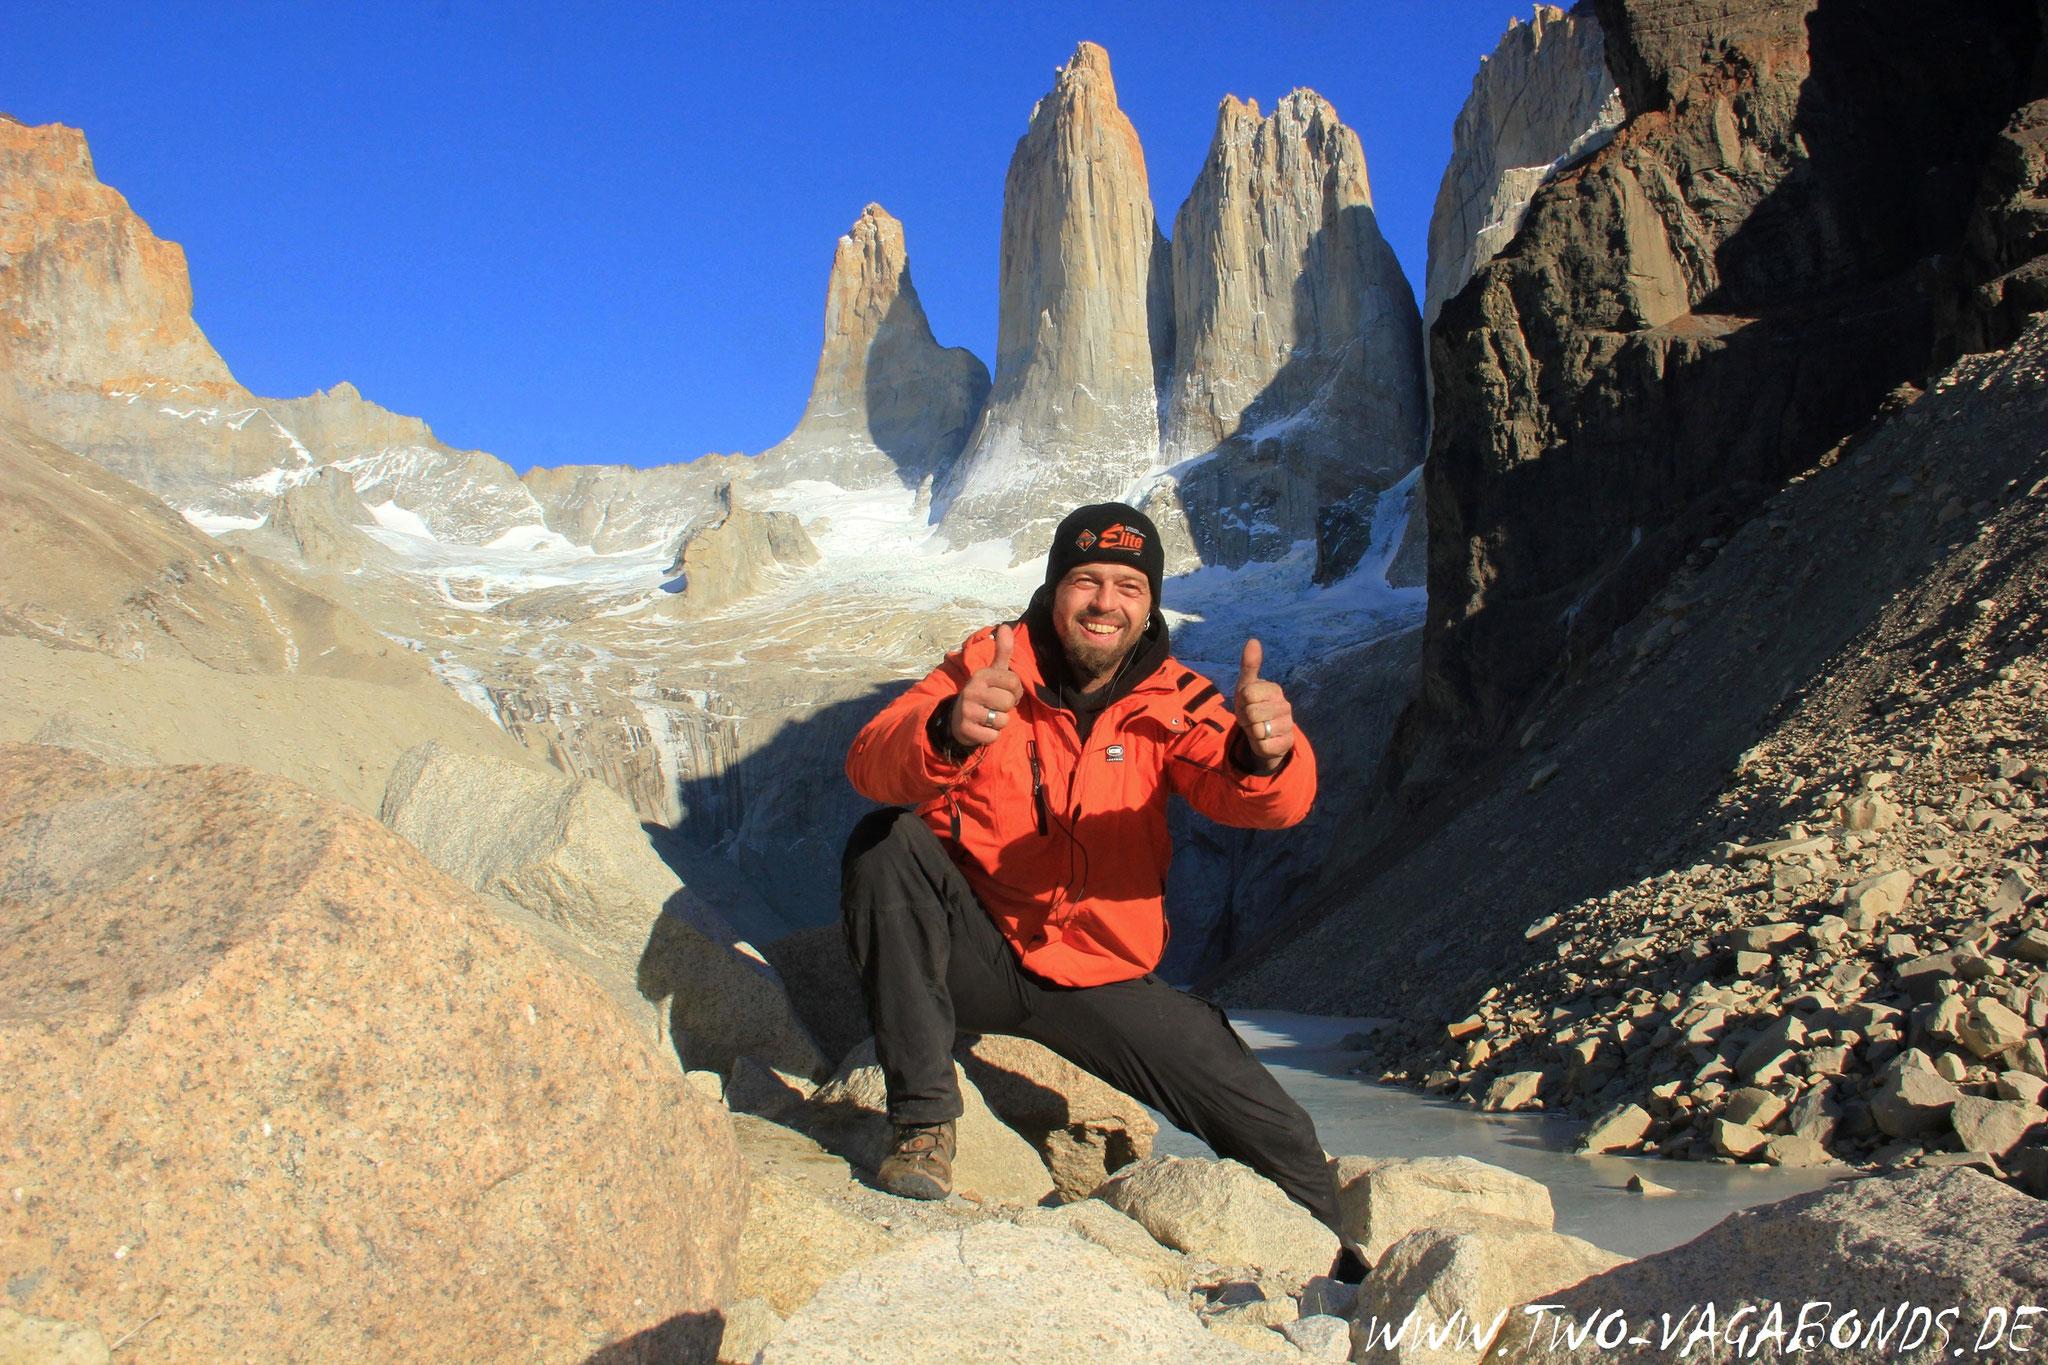 CHILE 2016 - PATAGONIEN - PUMA IM TORRES DEL PAINE - LOOKOUT